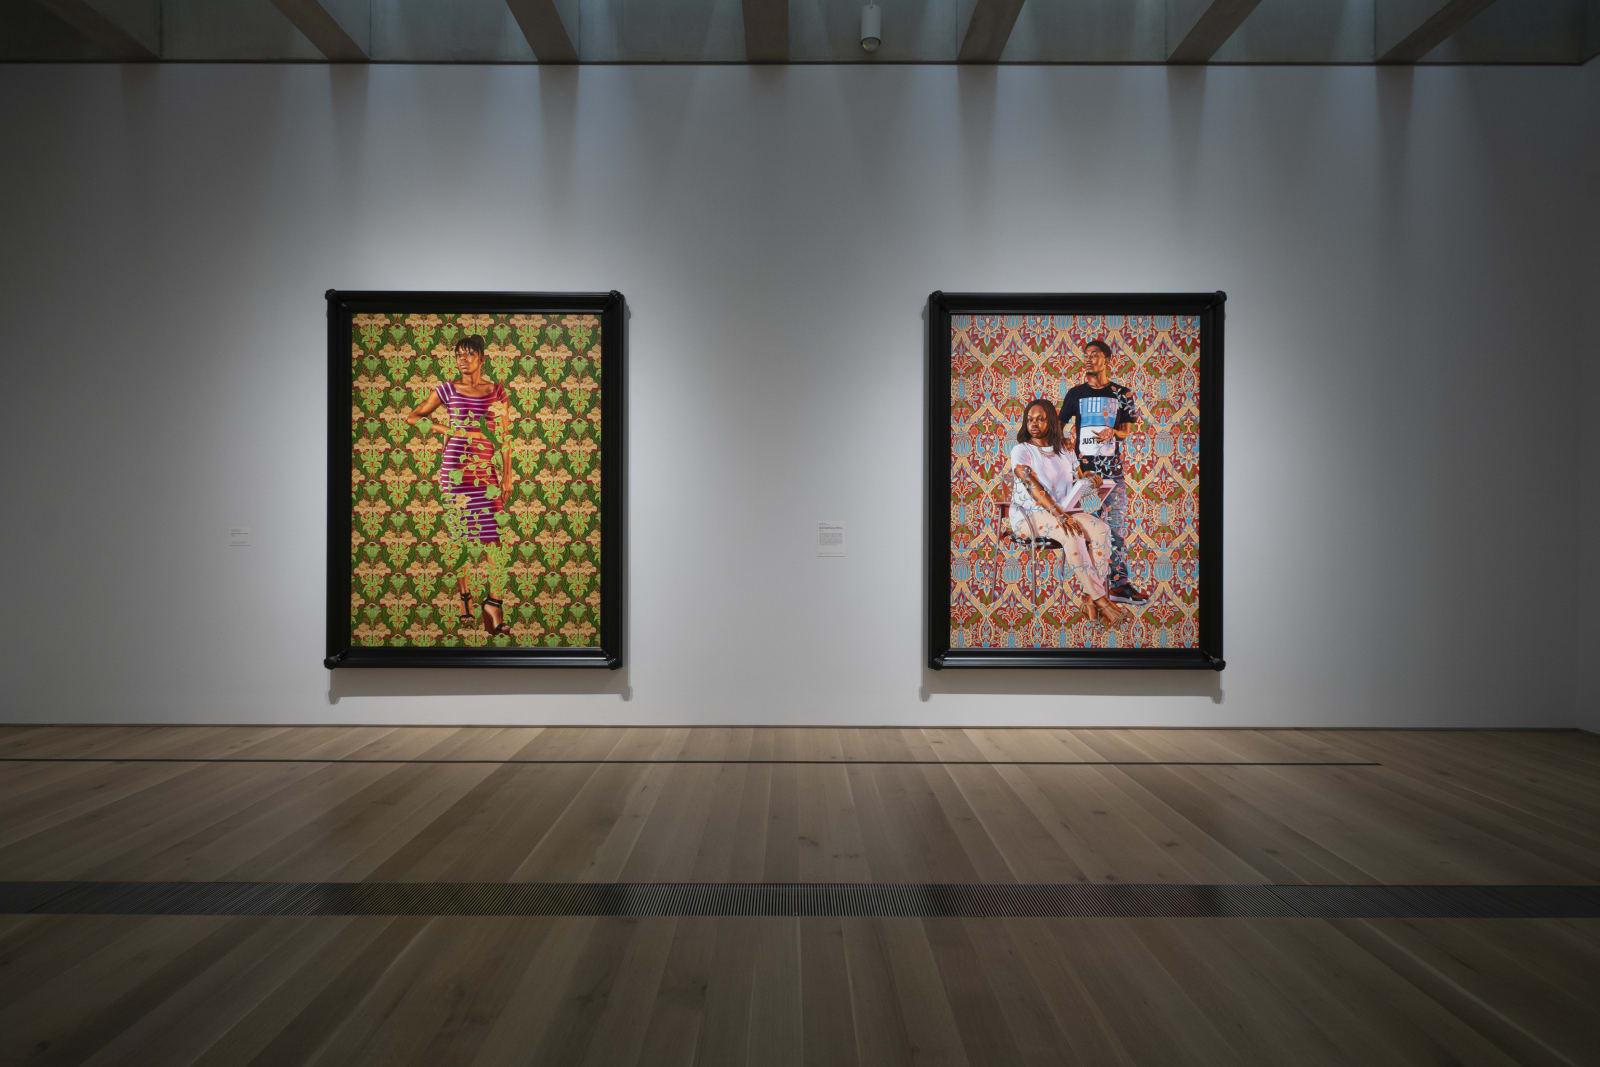 <p>Installation view: 'Kehinde Wiley: Saint Louis', Saint Louis Art Museum, Saint Louis, MO (2018-2019)</p>